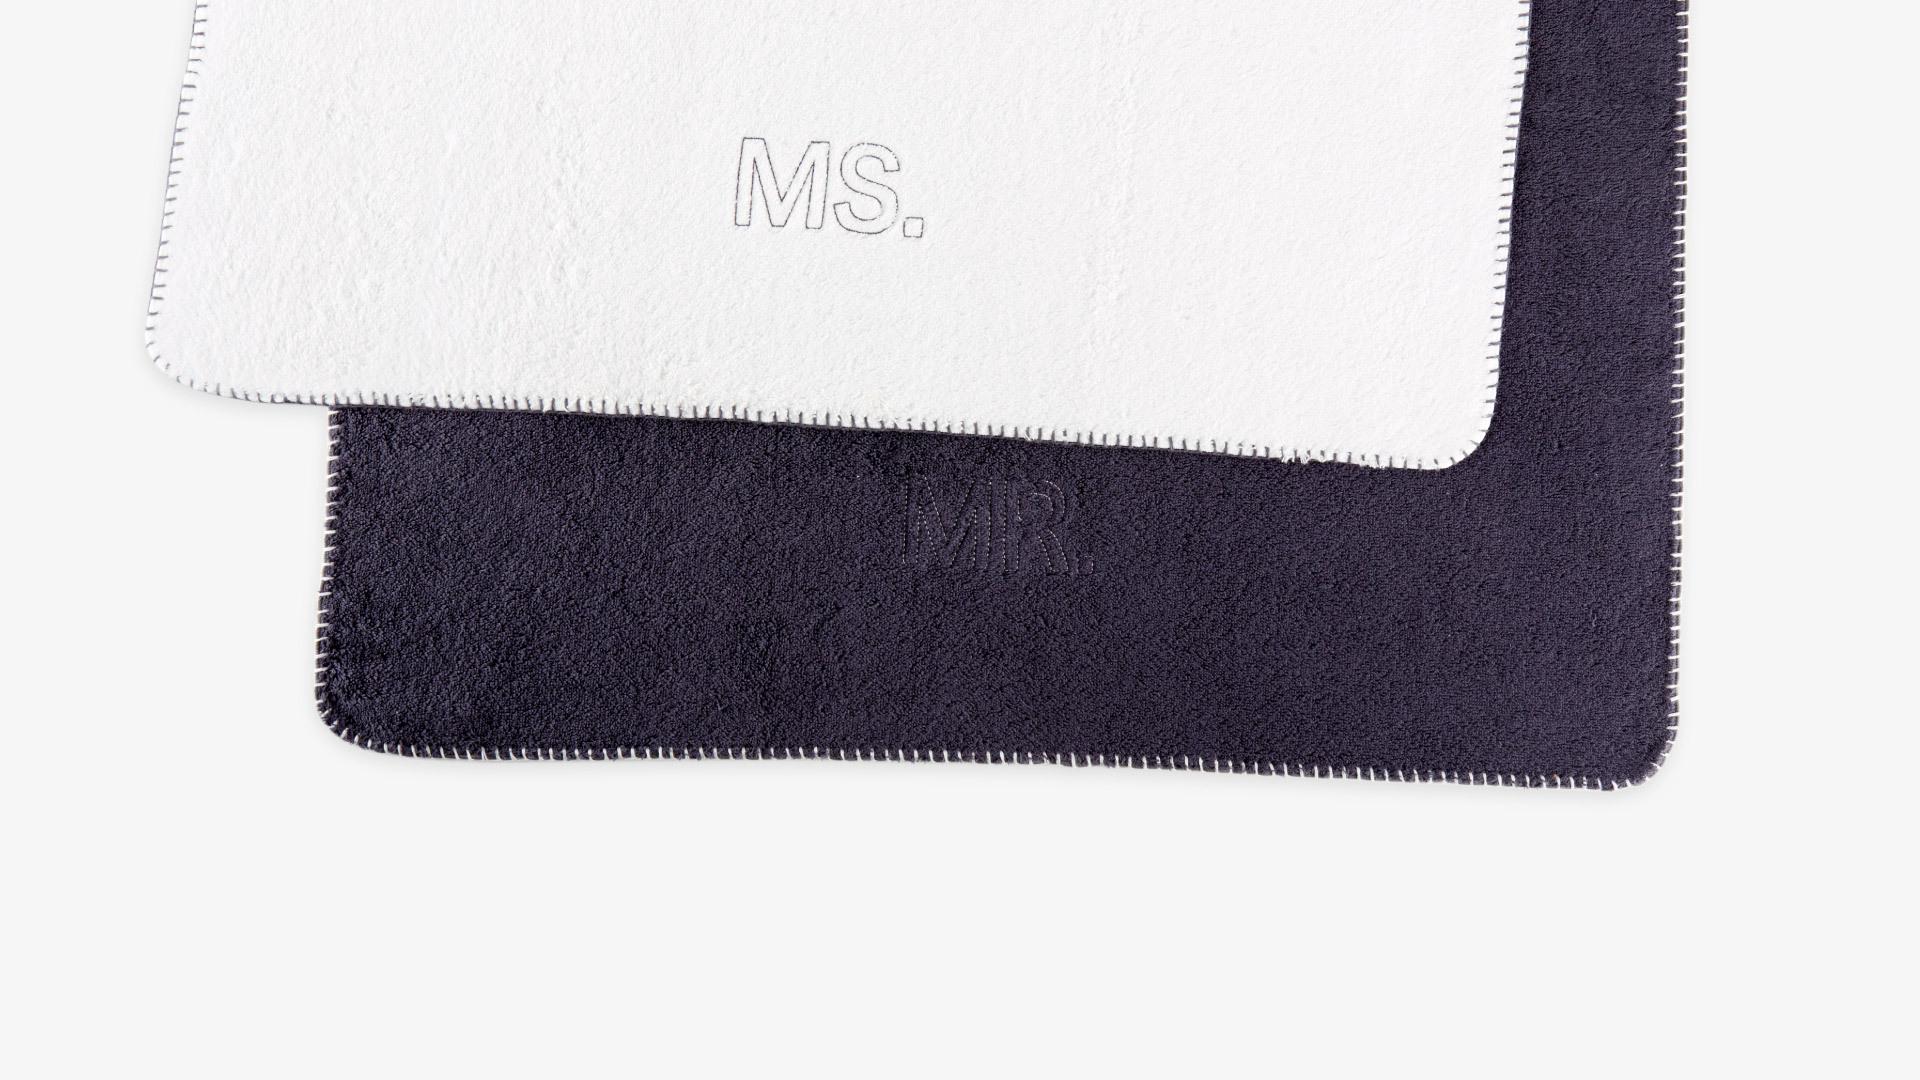 MR×MS标识,CP专属暗语